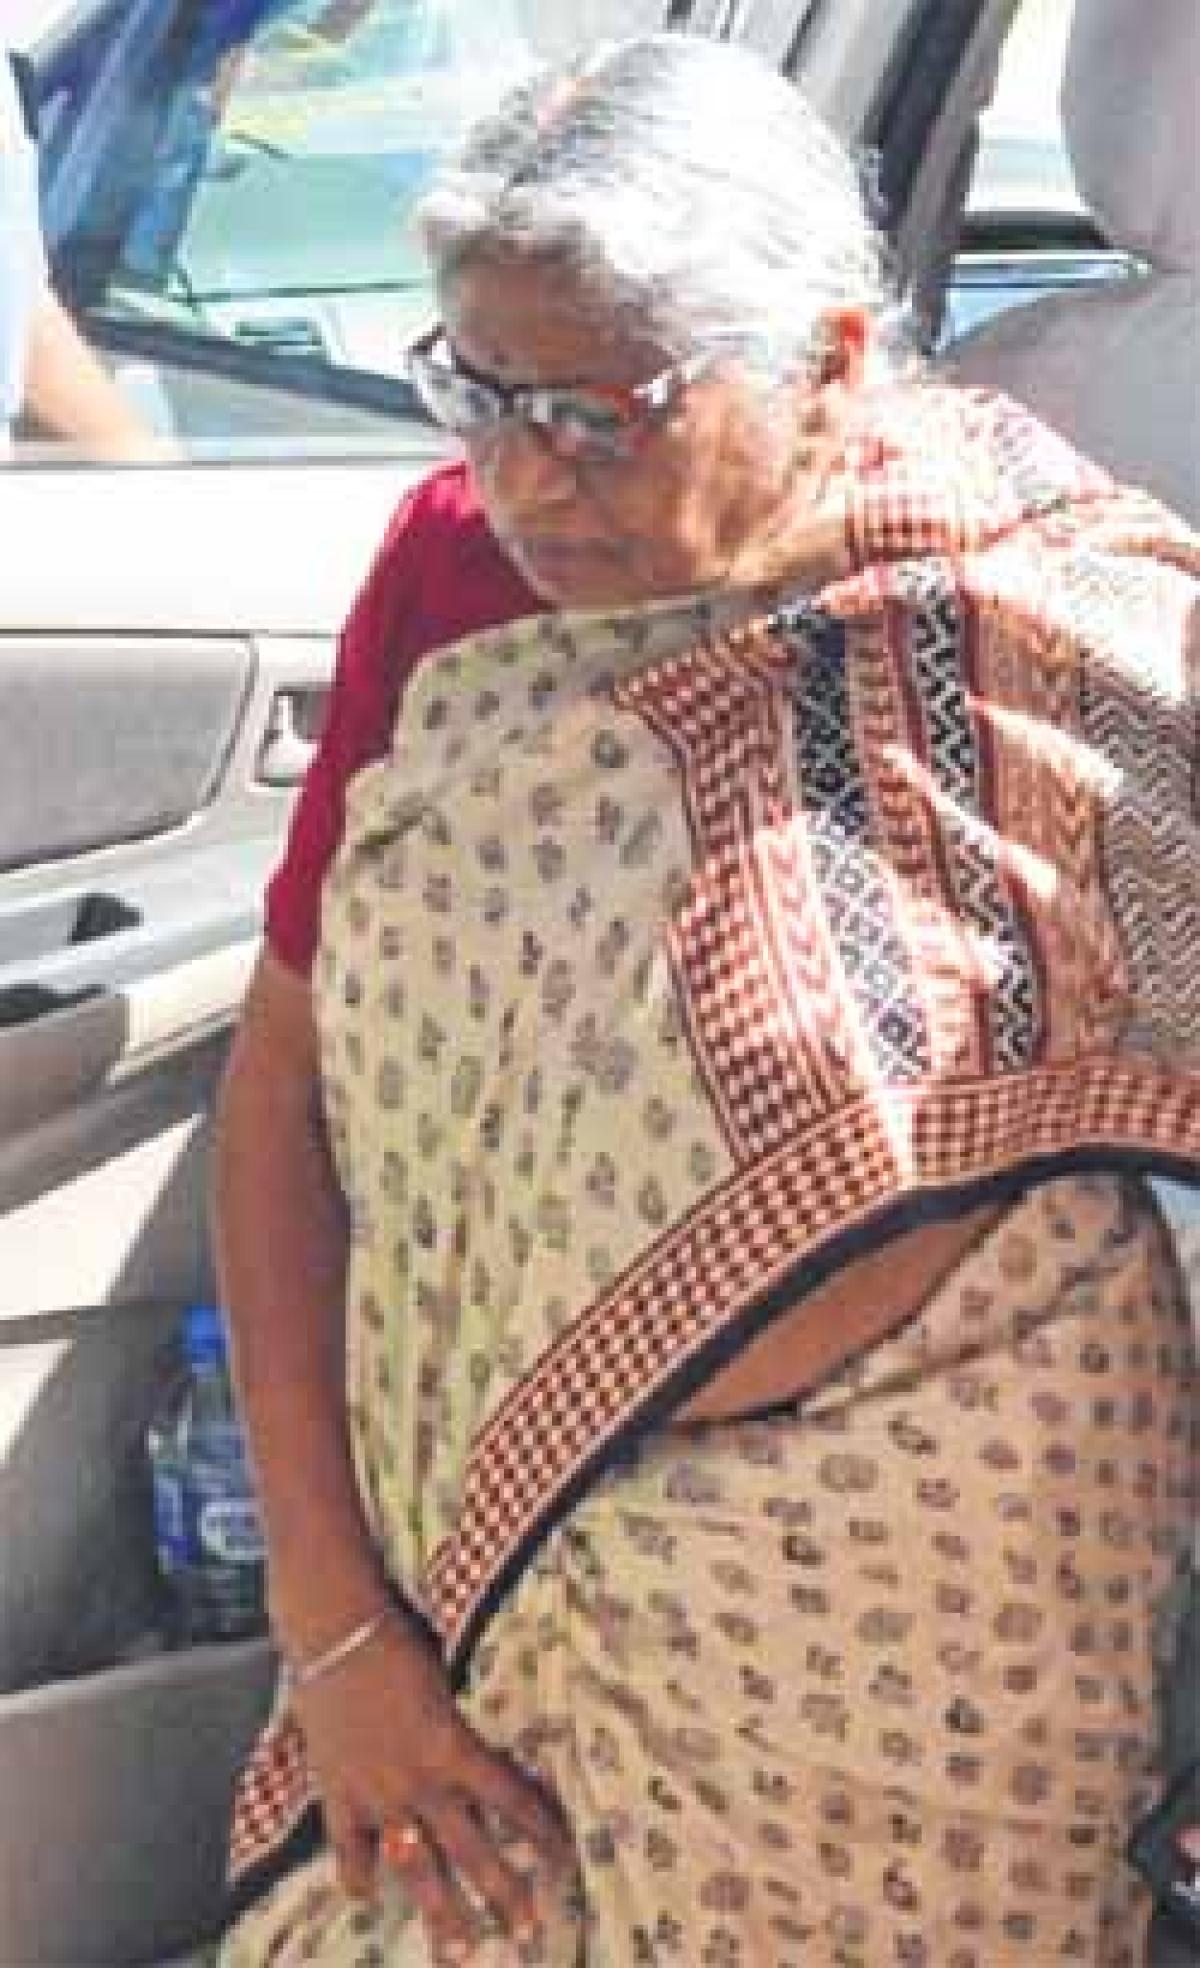 Bhopal: Bade bade deshon mein aisee chhoti-chhoti batein hoti rahte hain